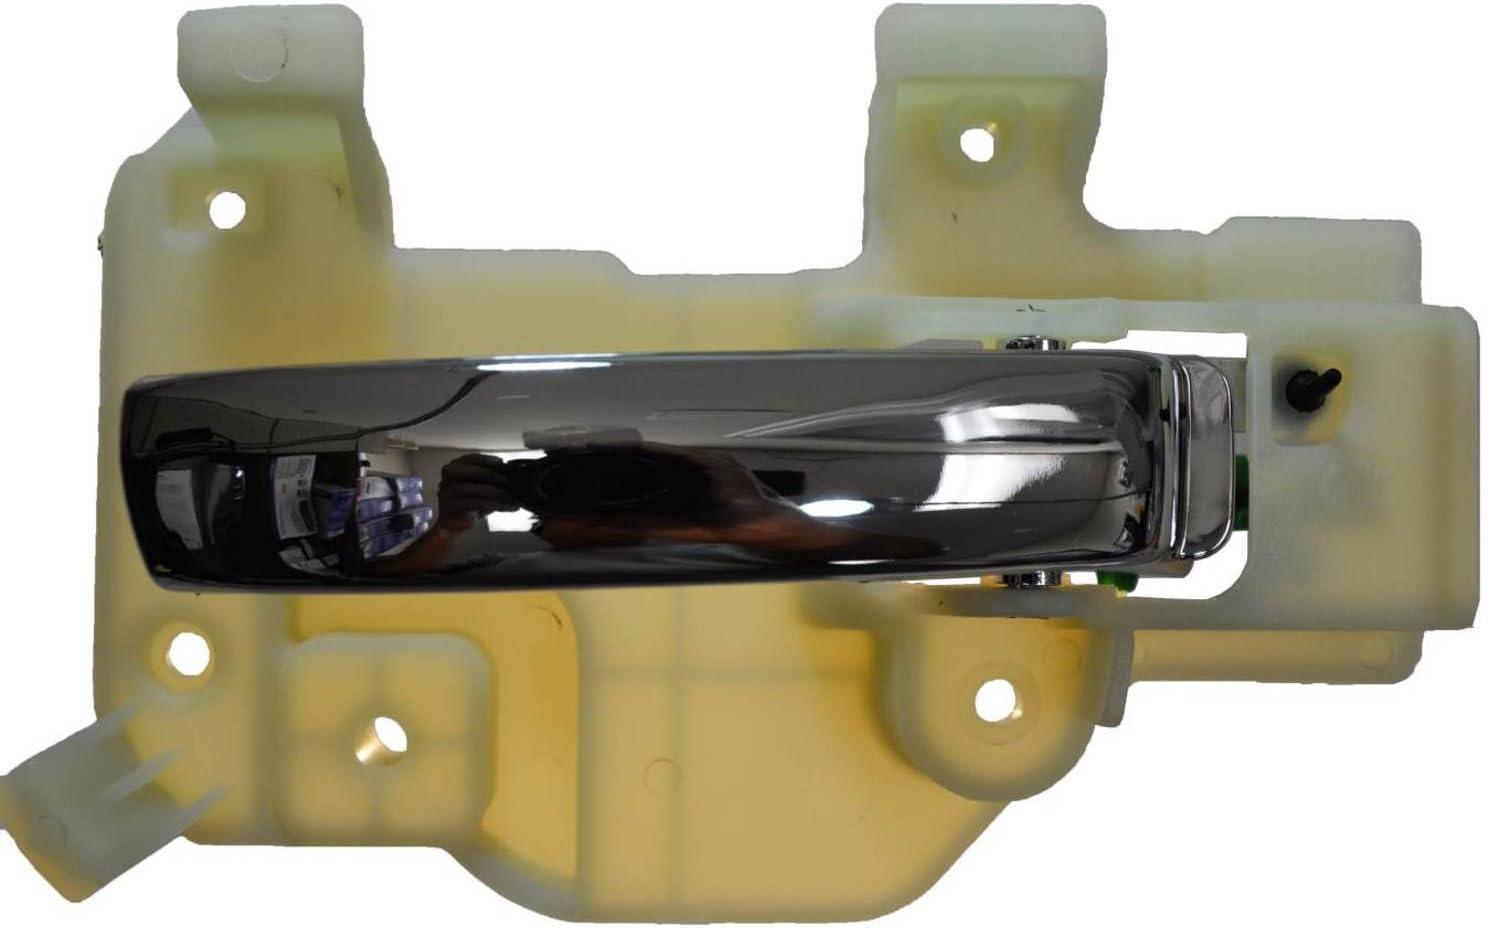 PT Auto ついに入荷 Warehouse CH-2309M-FR - Inside Interior 即納送料無料! Door Handl Inner